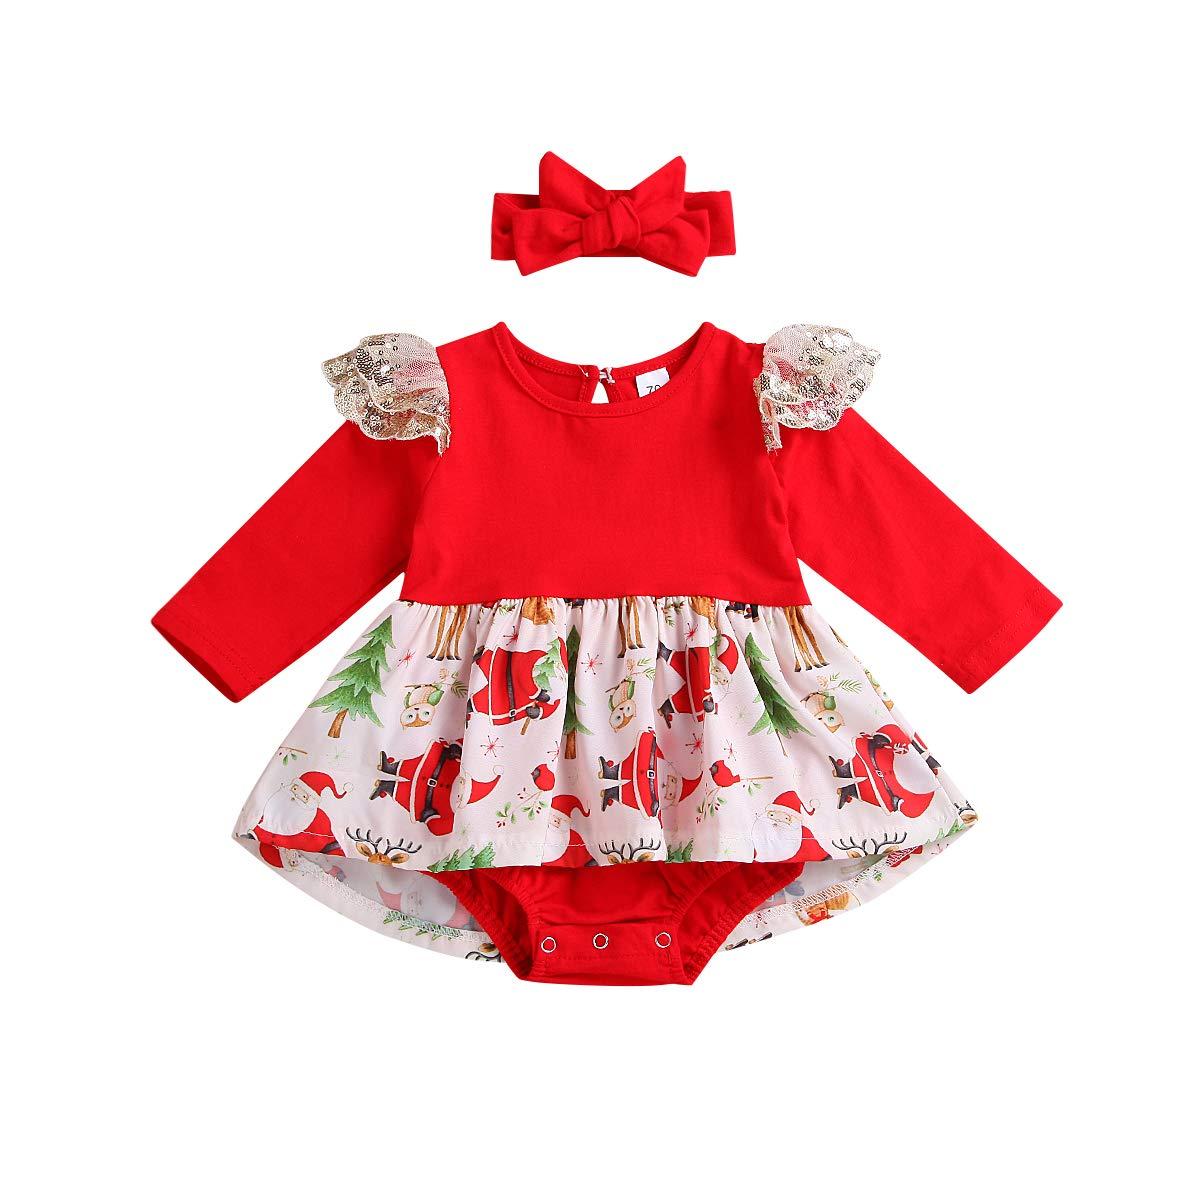 Amazon.com: Vestido de manga larga para bebé, de Navidad ...